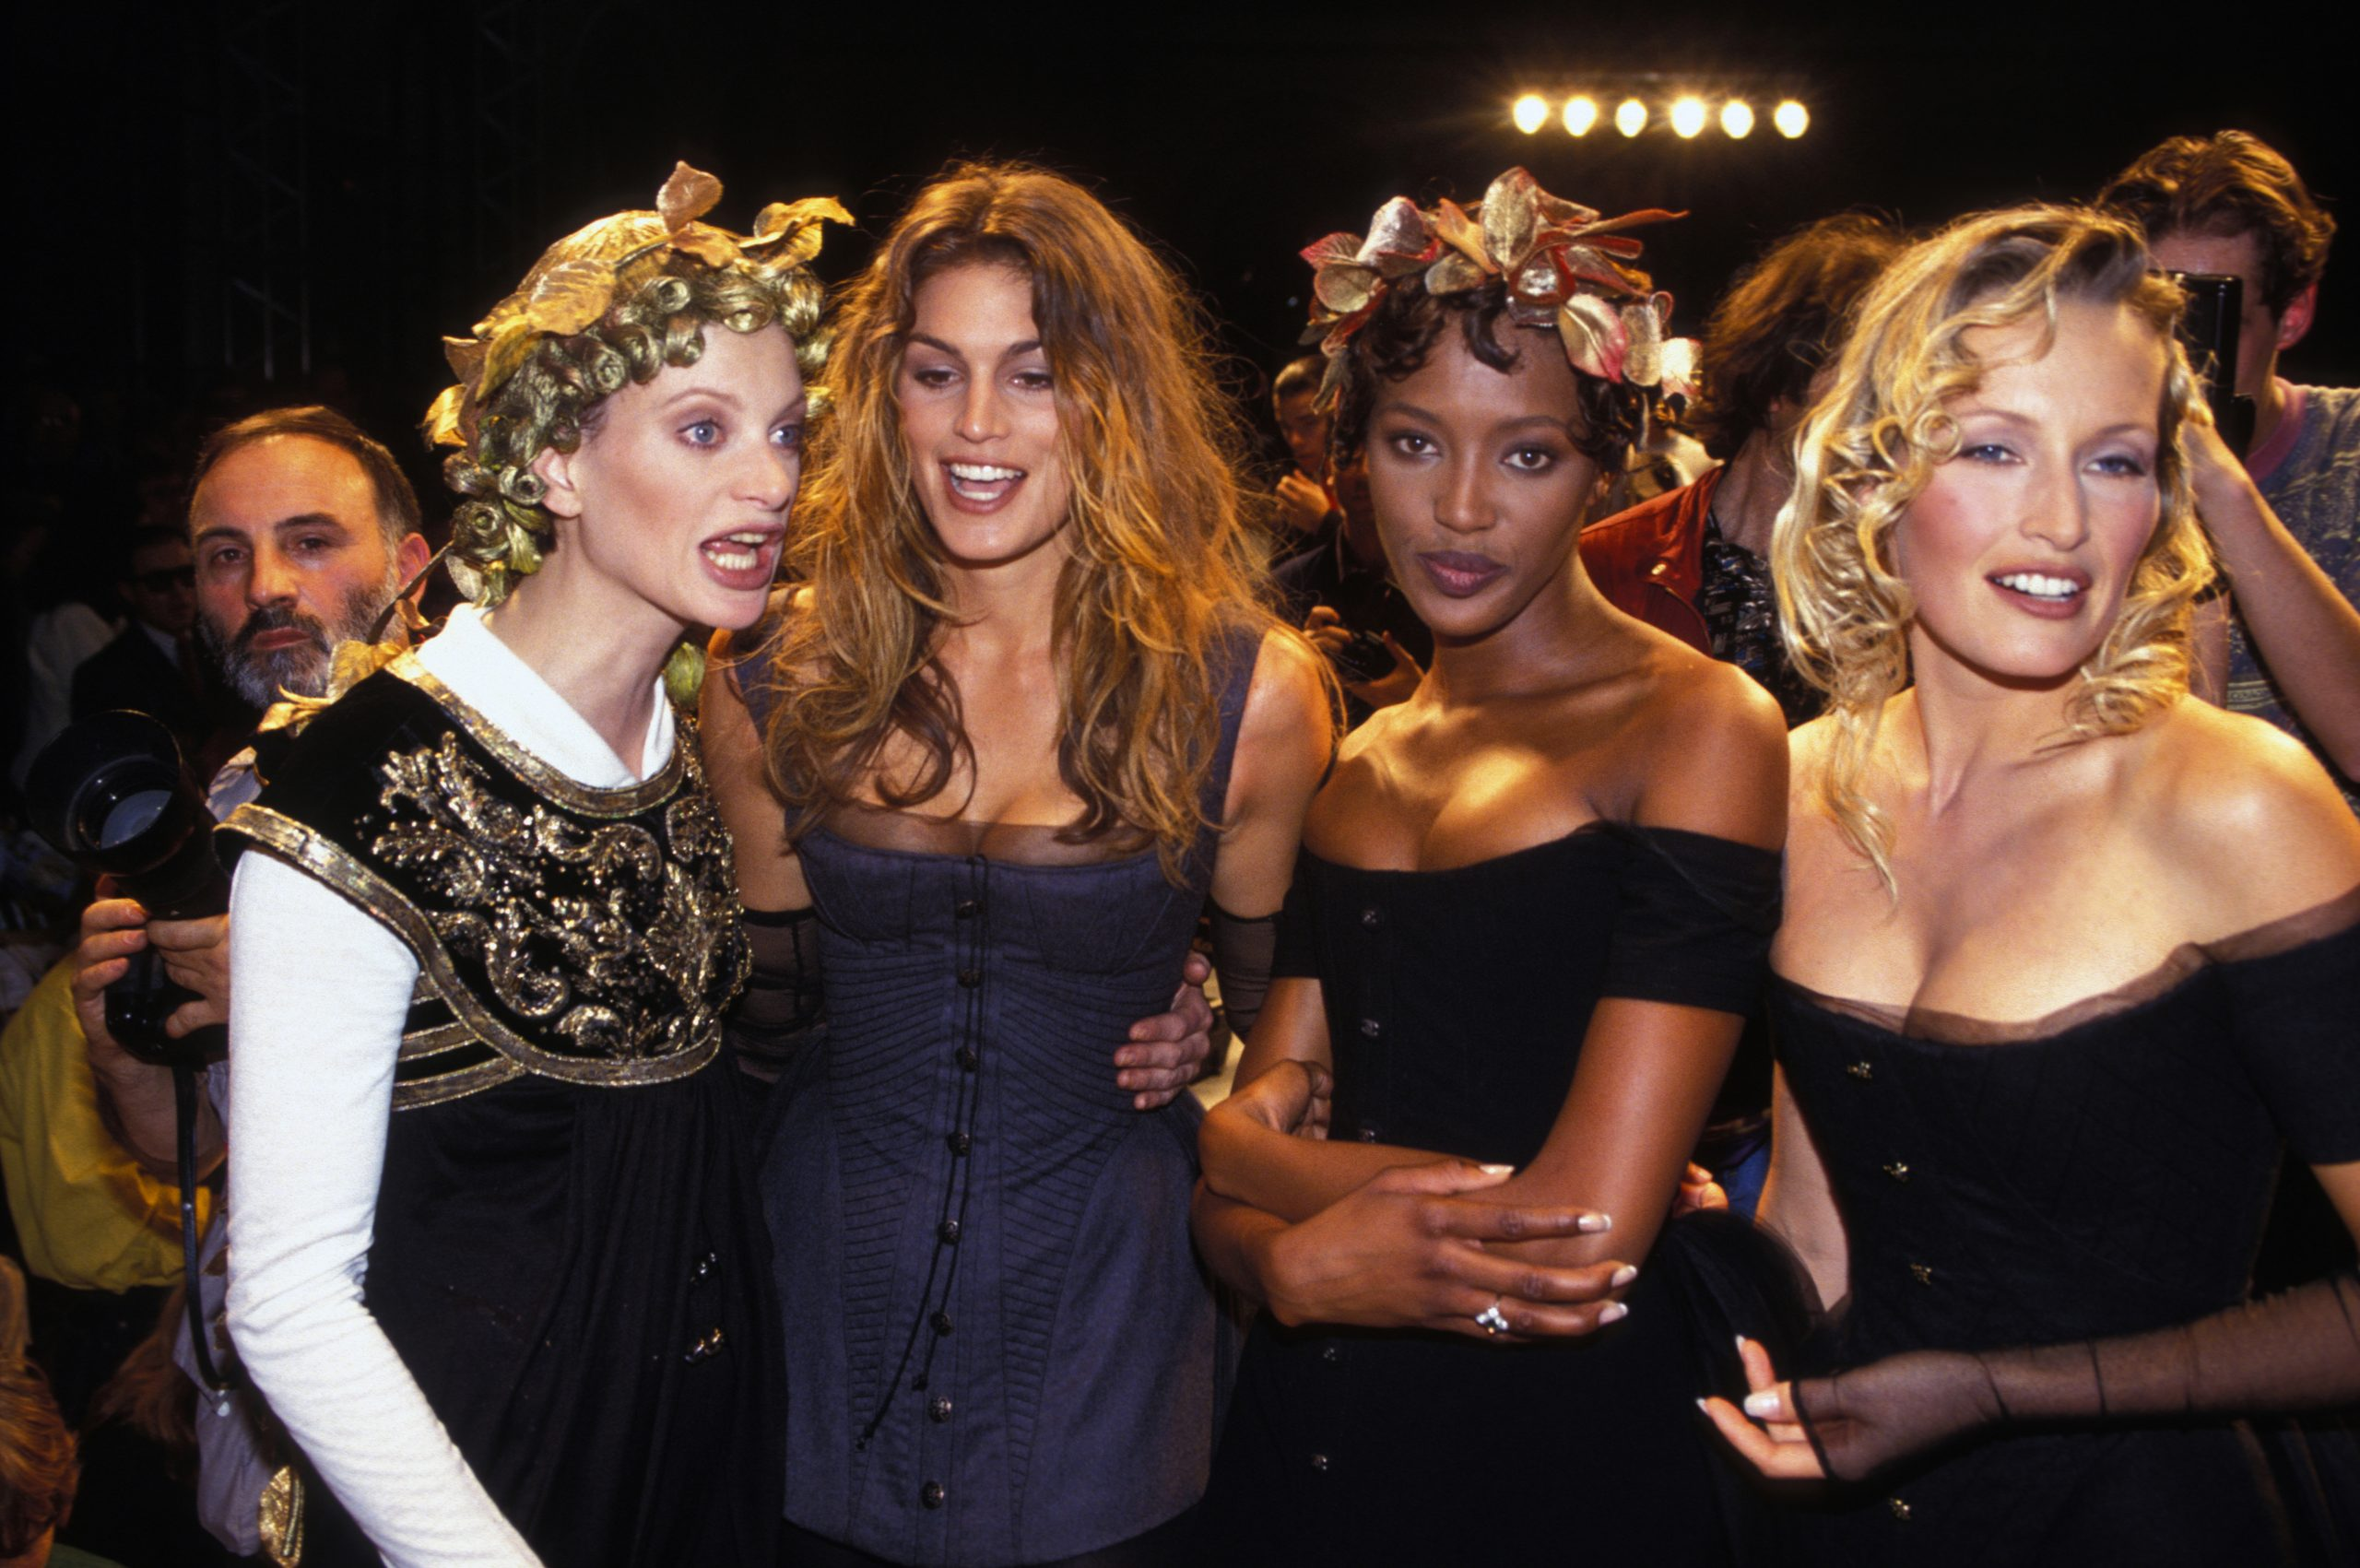 Les idoles du Prince William : Cindy Crawford et Naomi Campbell.